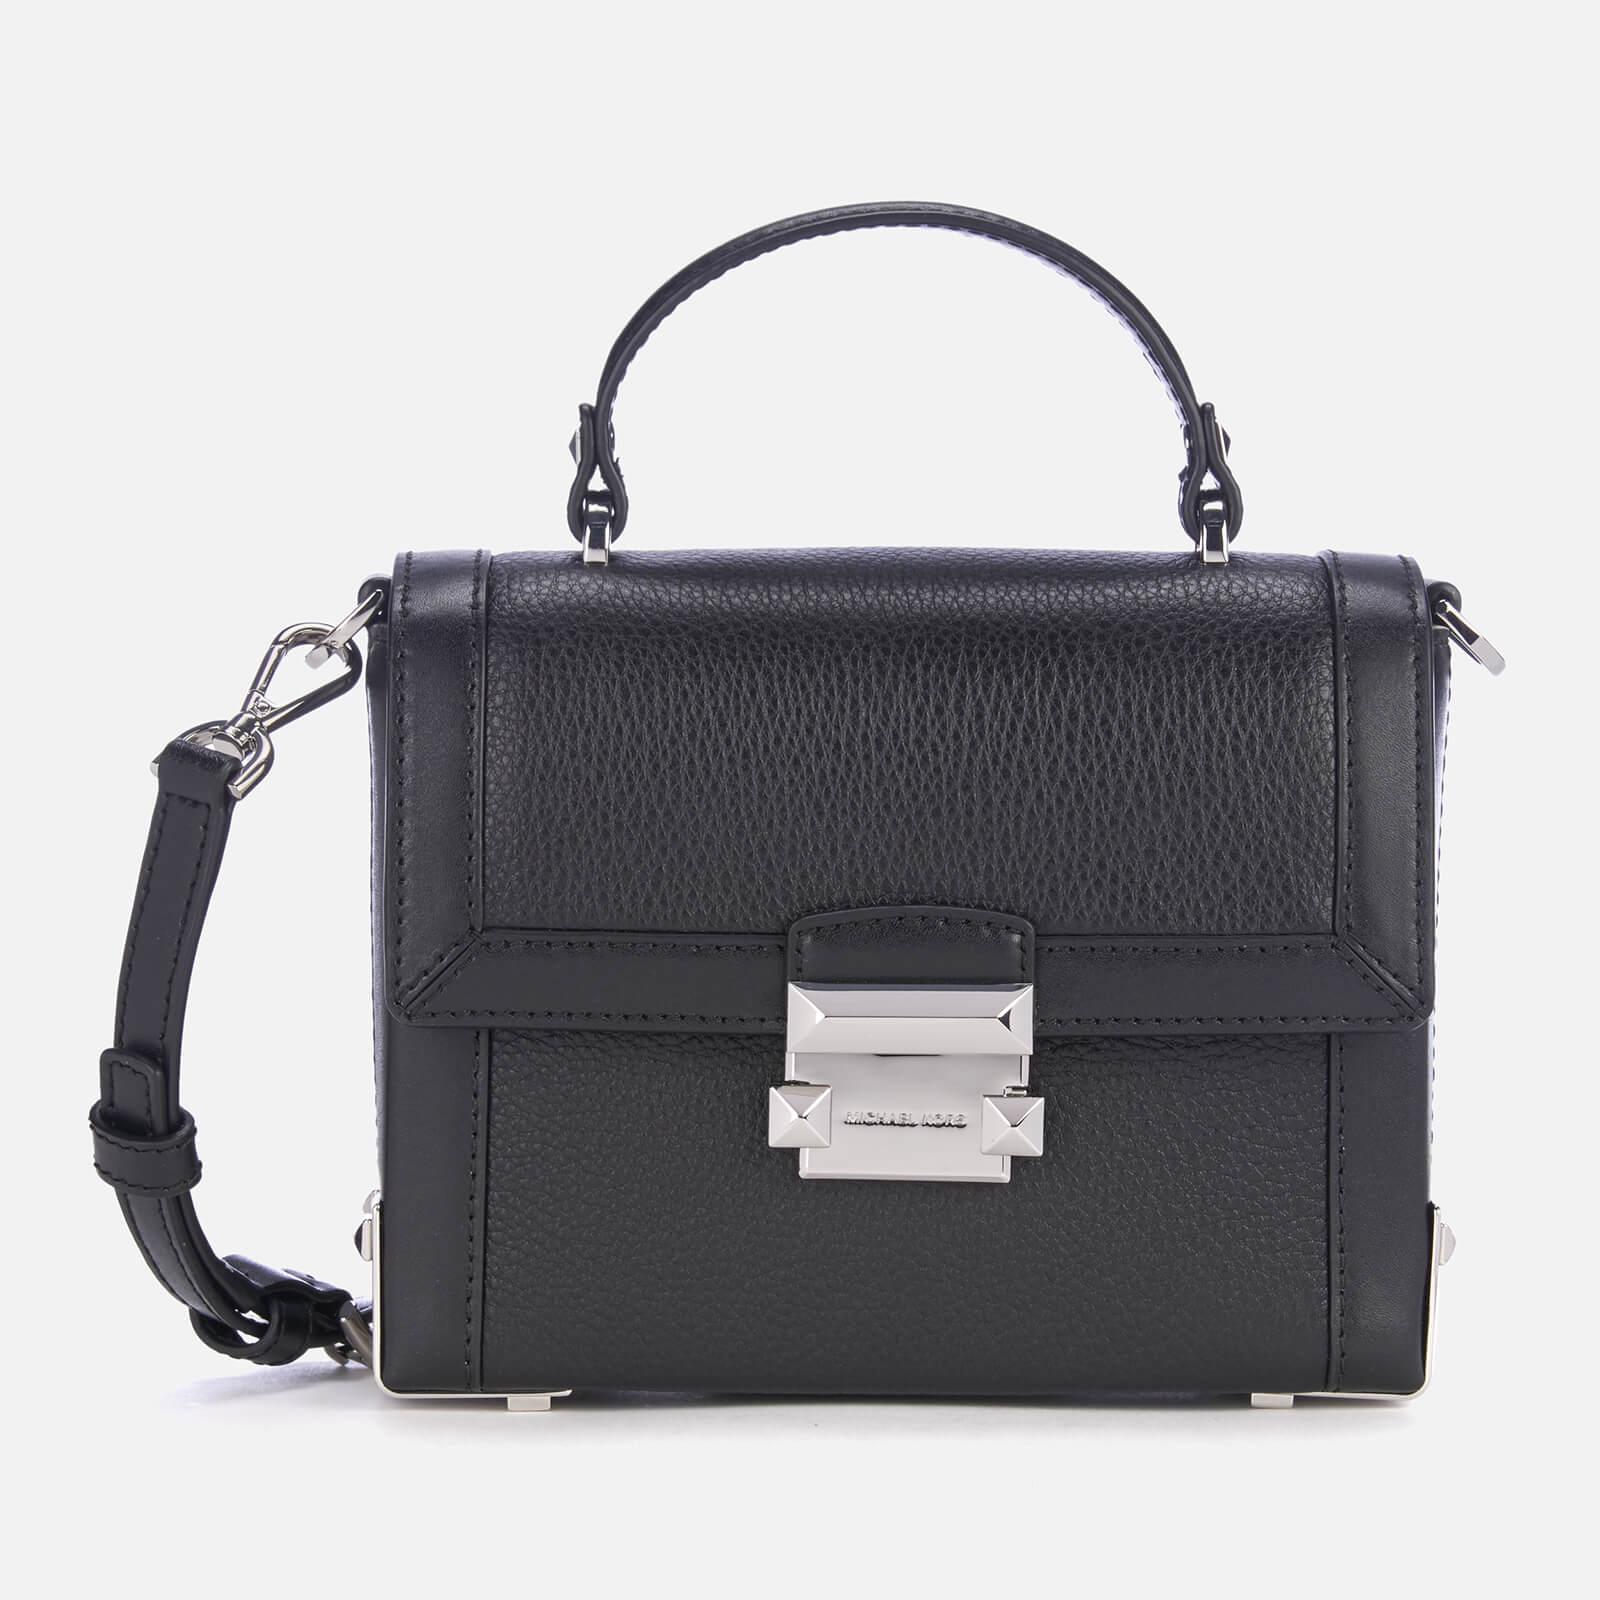 01971a5aced MICHAEL MICHAEL KORS Women's Jayne Small Trunk Bag - Black